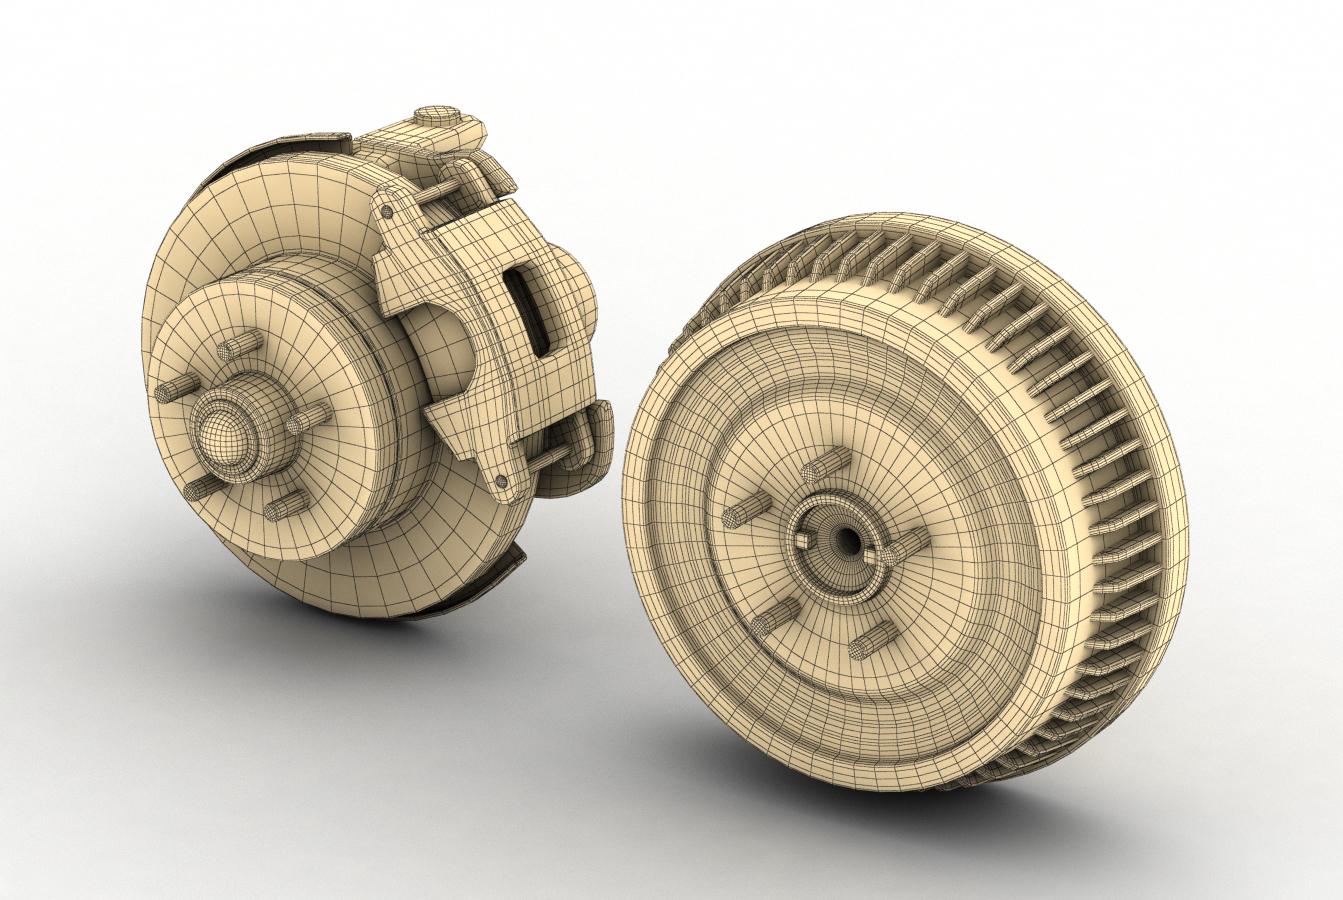 car and truck brake set 3d model 3ds max fbx obj 282208